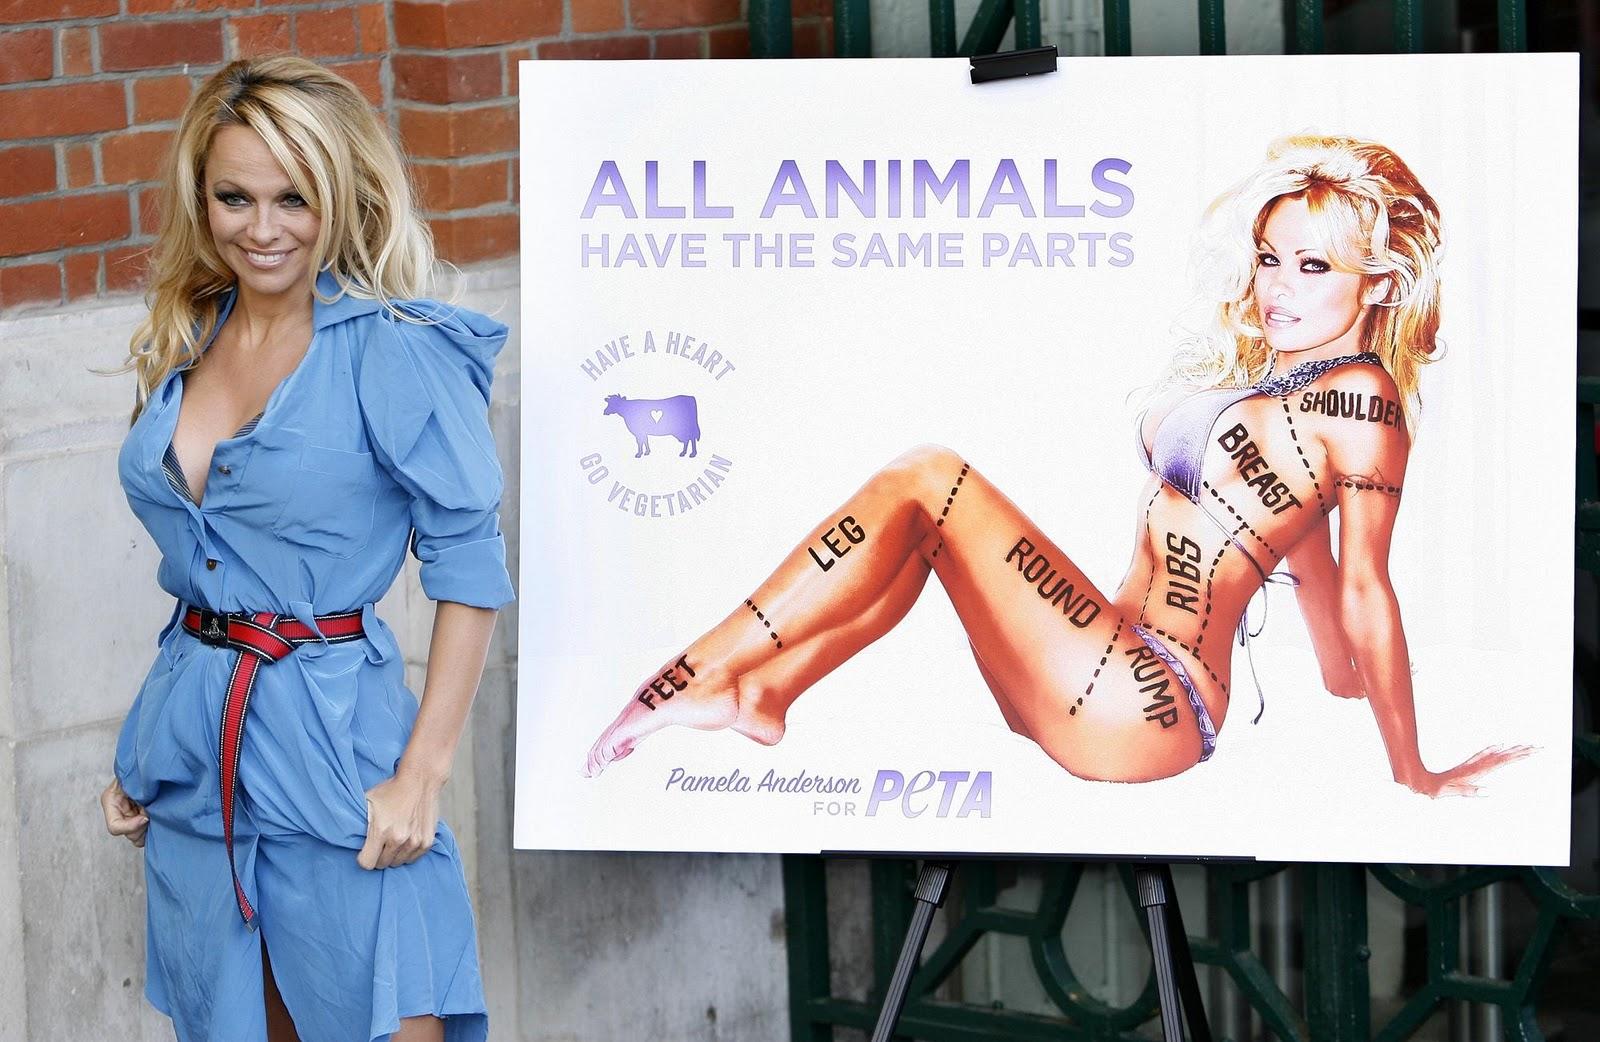 http://3.bp.blogspot.com/-NJLsOKg022g/TnjJNfeNumI/AAAAAAAACOI/z1kT1mnxqxE/s1600/pamela-anderson-peta-animali.jpg